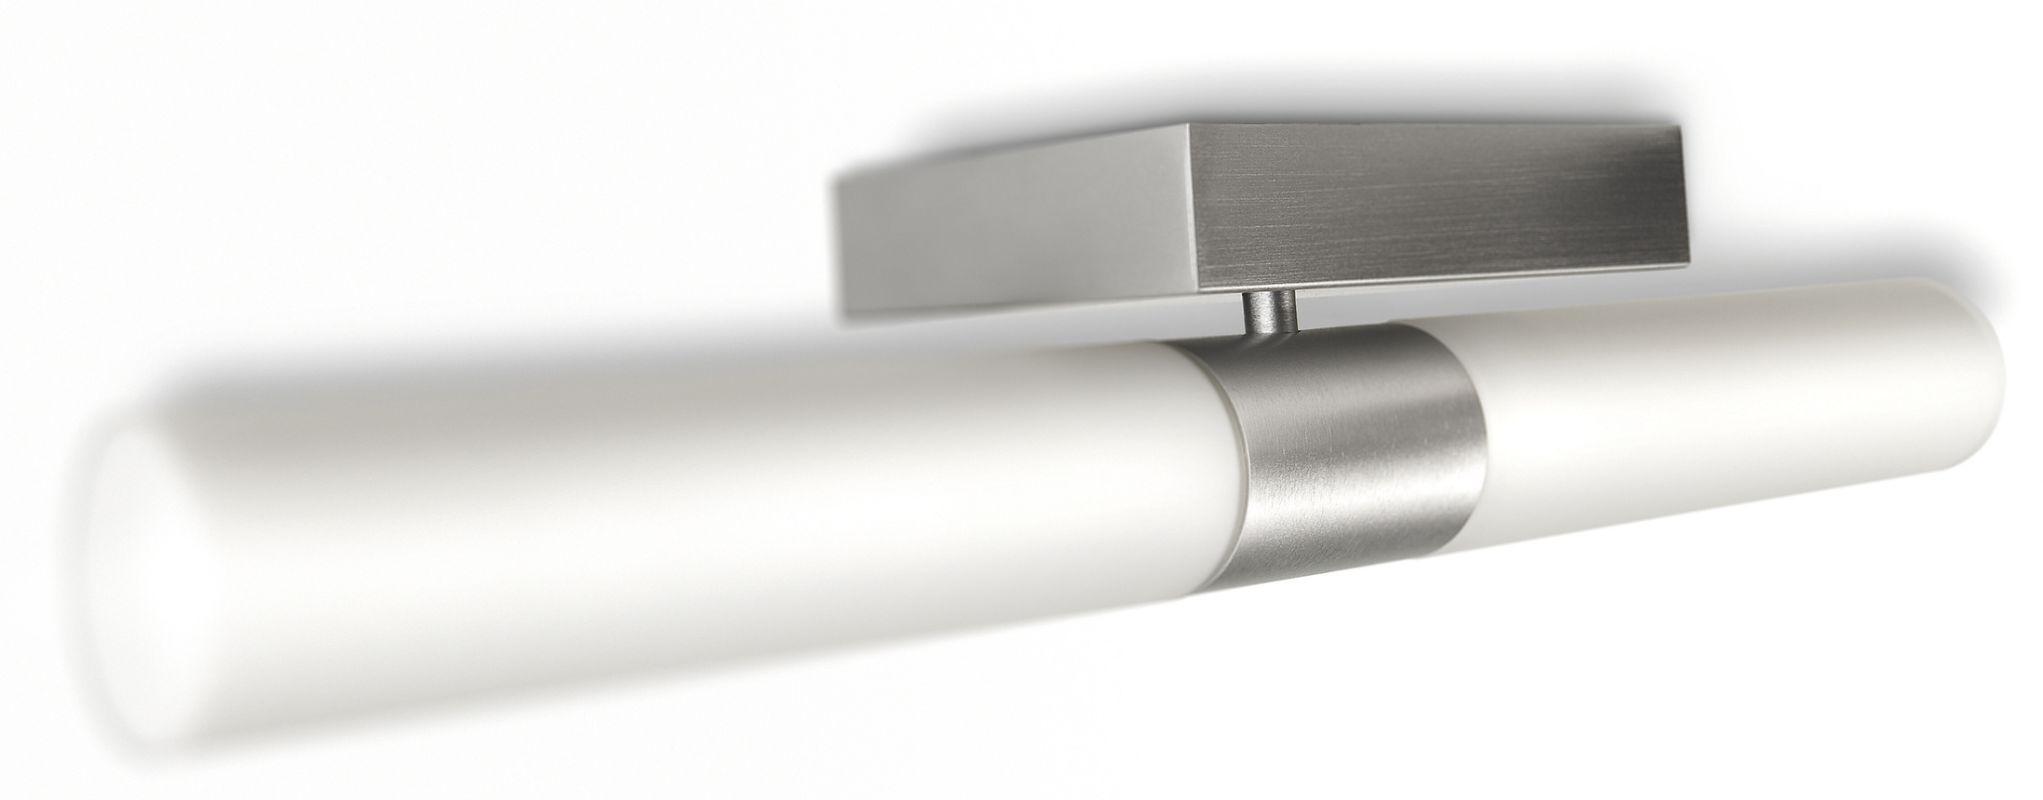 UPC 046677794491 Philips 368014848 Aluminum Ecomoods 1